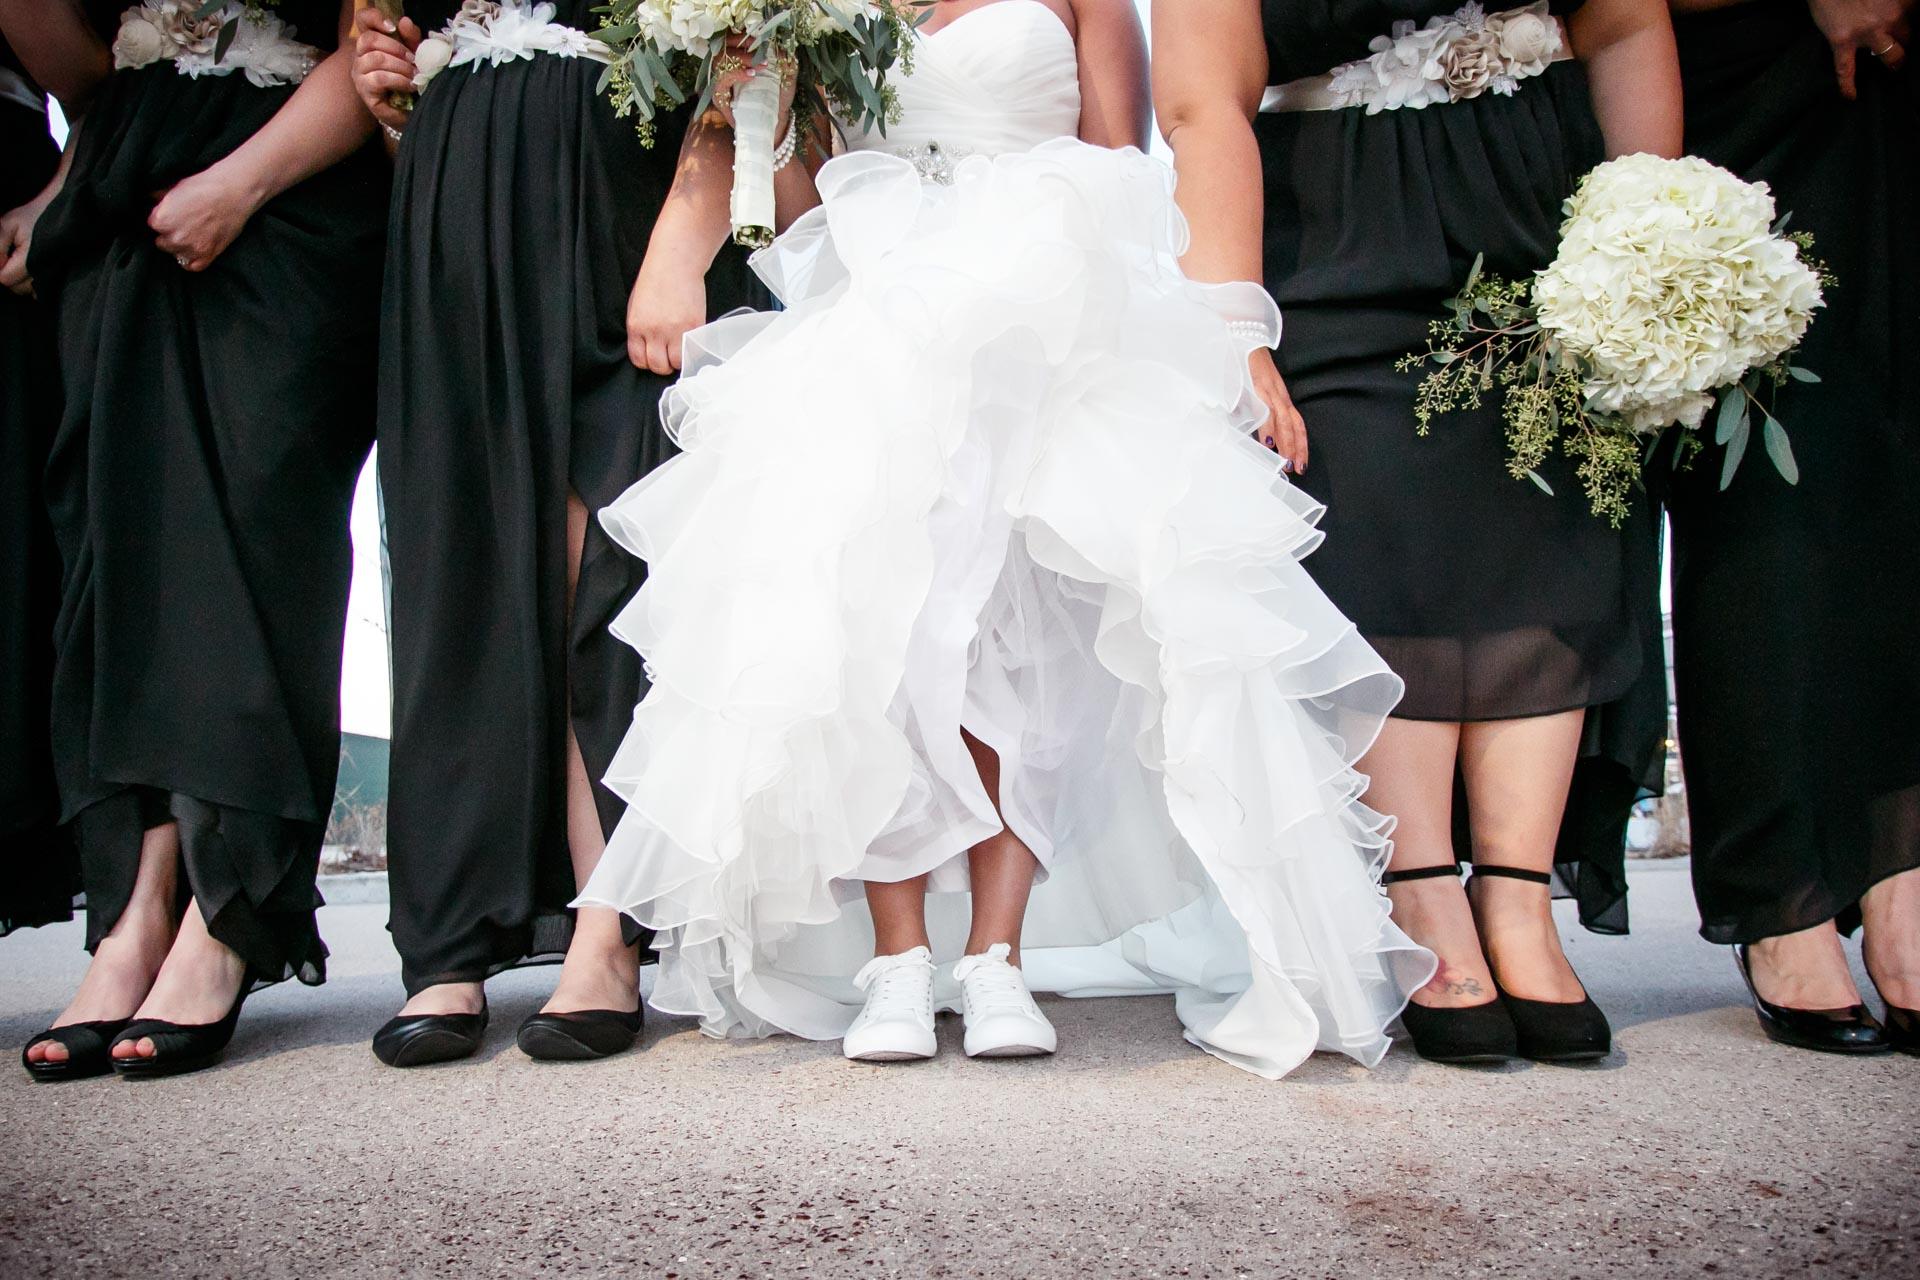 wedding-2-adam-shea-photography-green-bay-appleton-neenah-photographer-25.jpg